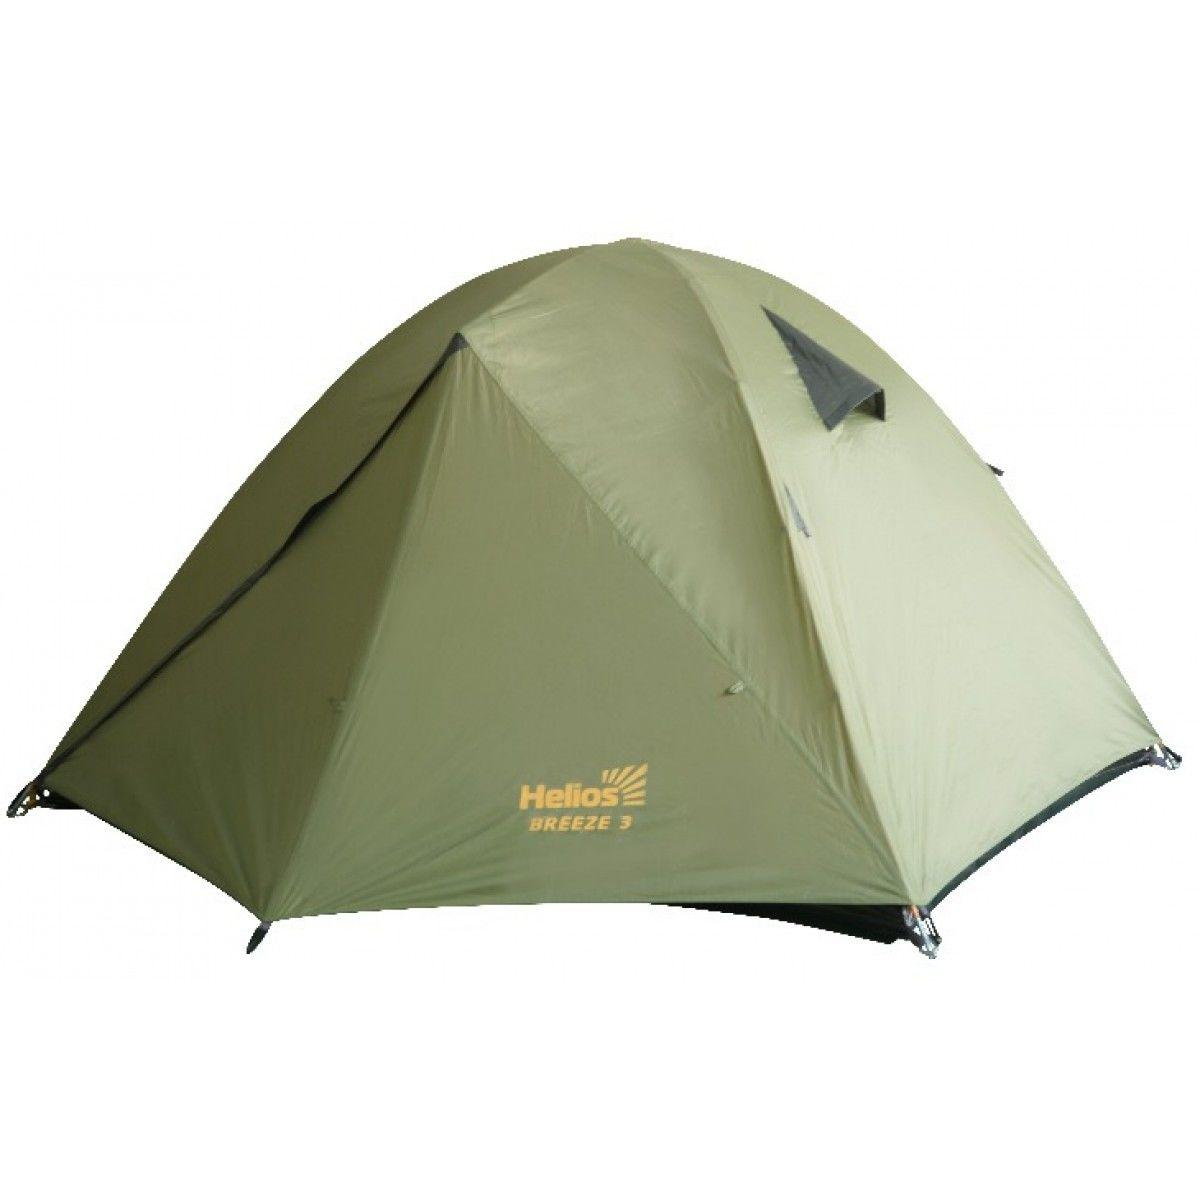 Палатка BREEZE-3 Helios зеленый HS-2370-3 - фото 1